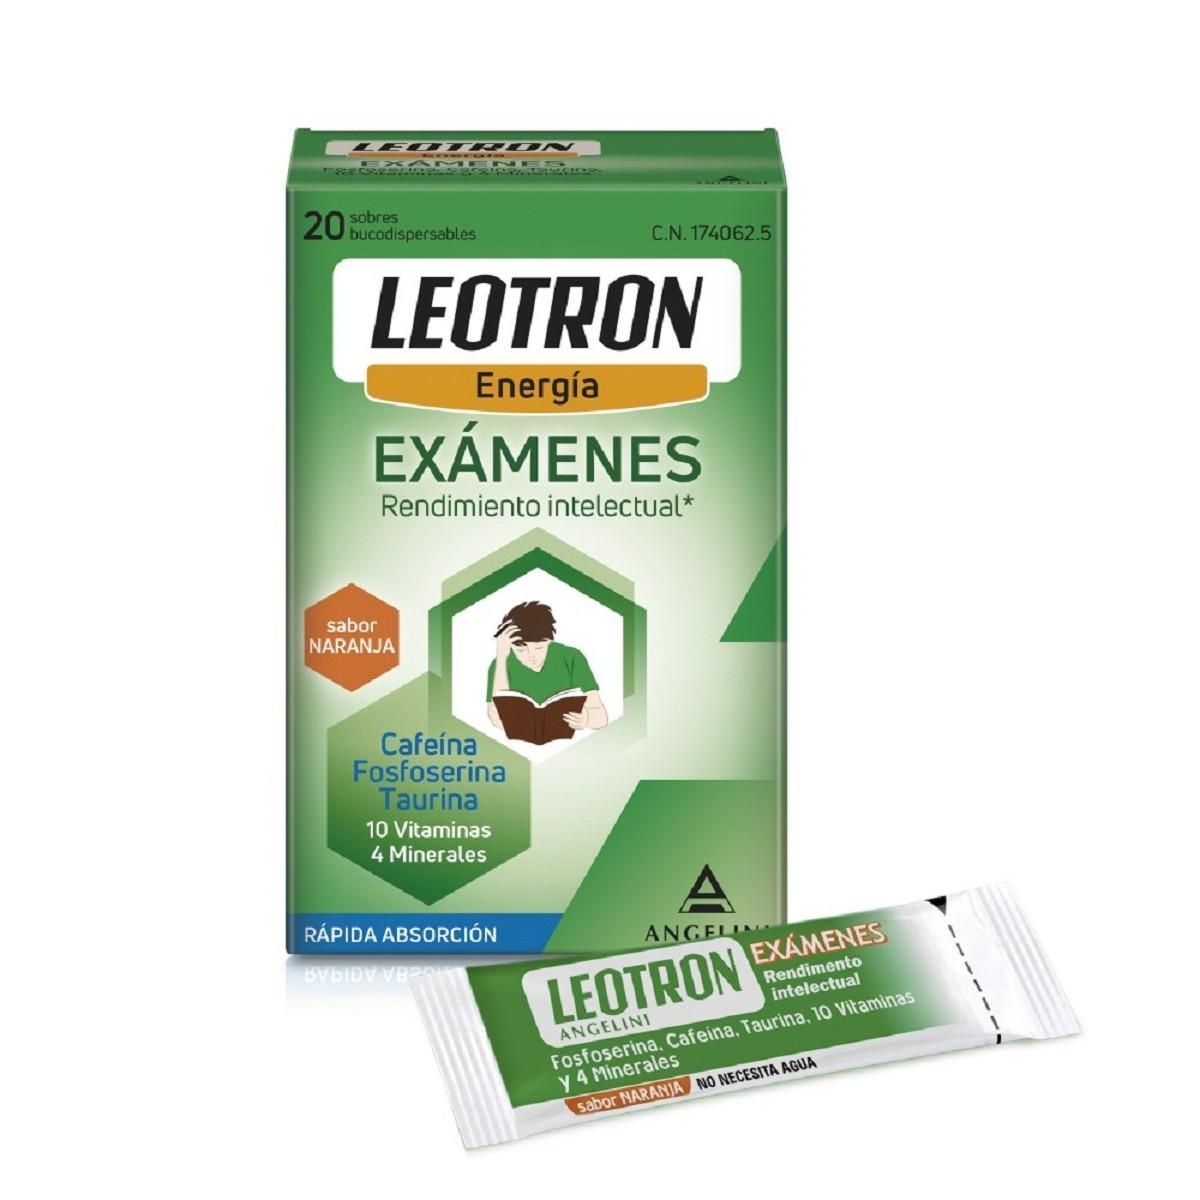 ¿Qué te aporta Leotron exámenes?